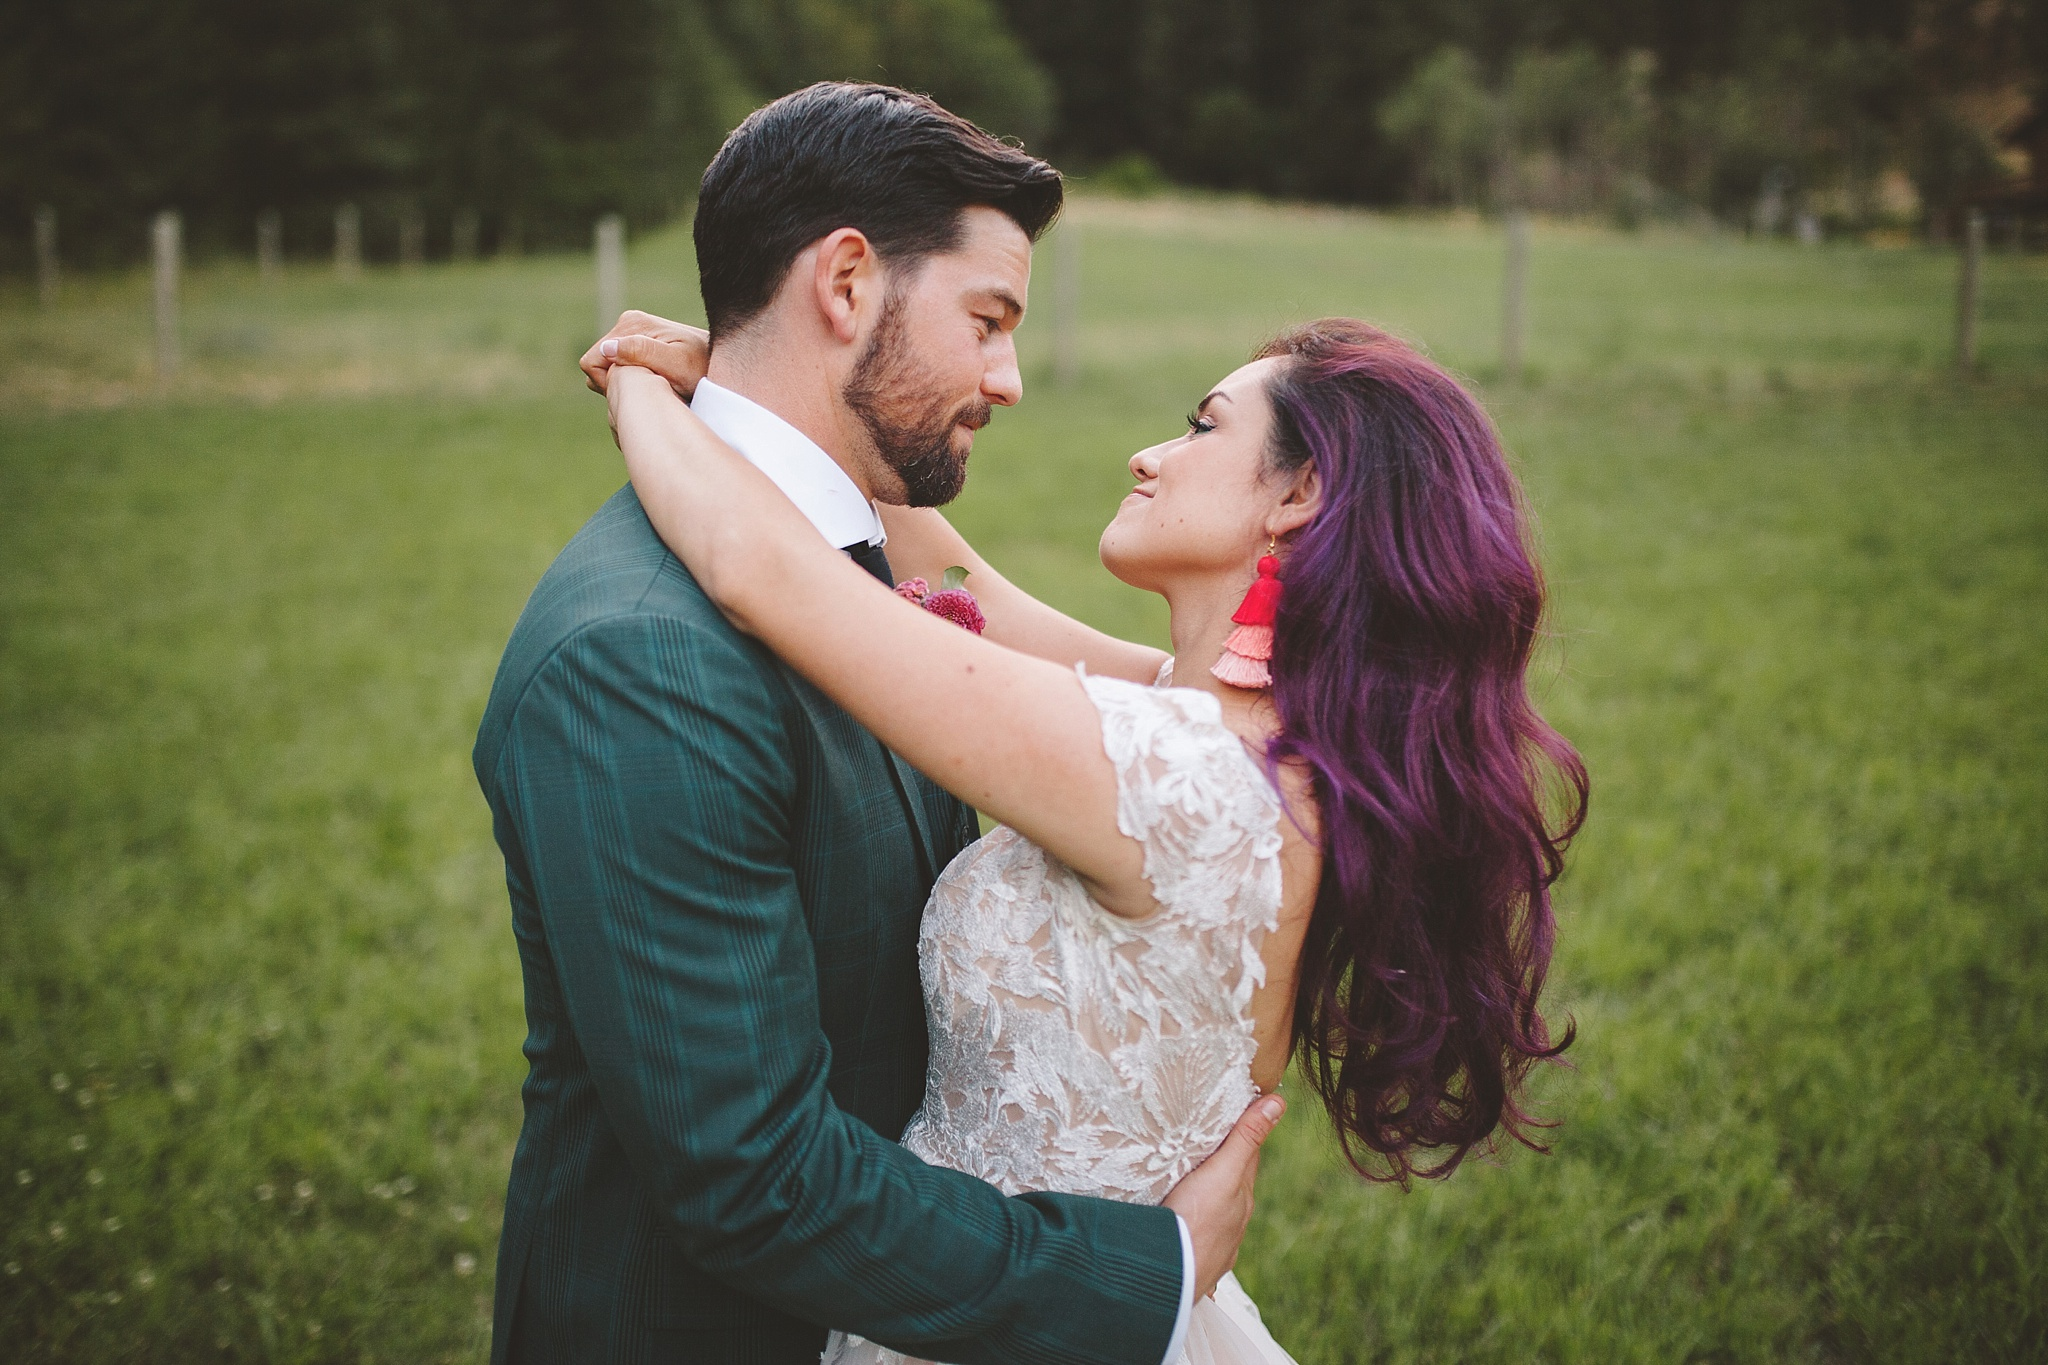 blue hour wedding portrait of bride and groom